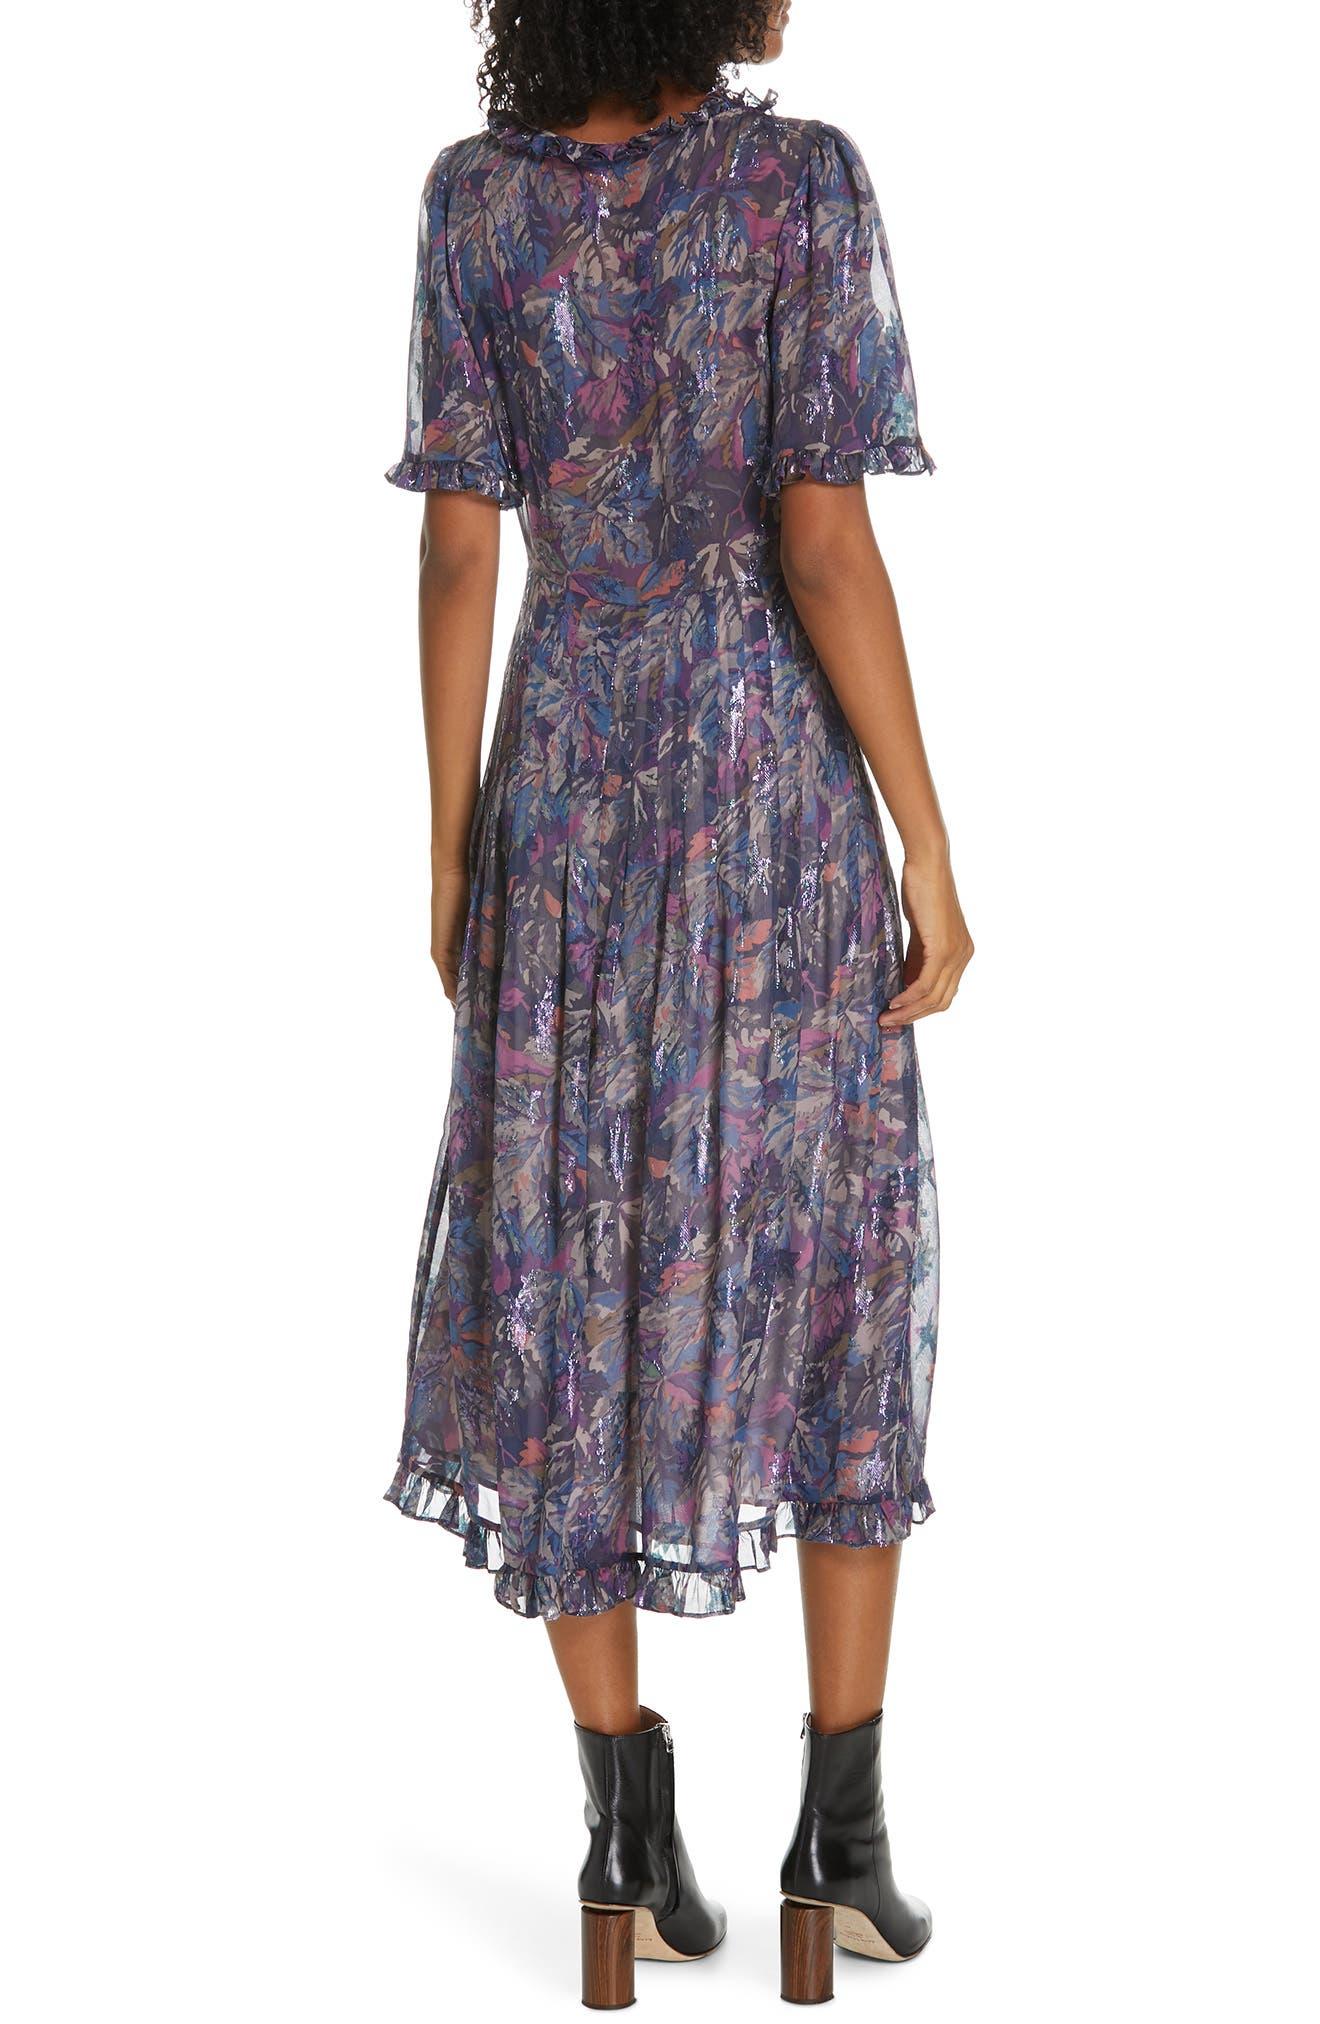 Giverny Metallic Detail Silk Chiffon Dress,                             Alternate thumbnail 2, color,                             AMETHYST COMBO